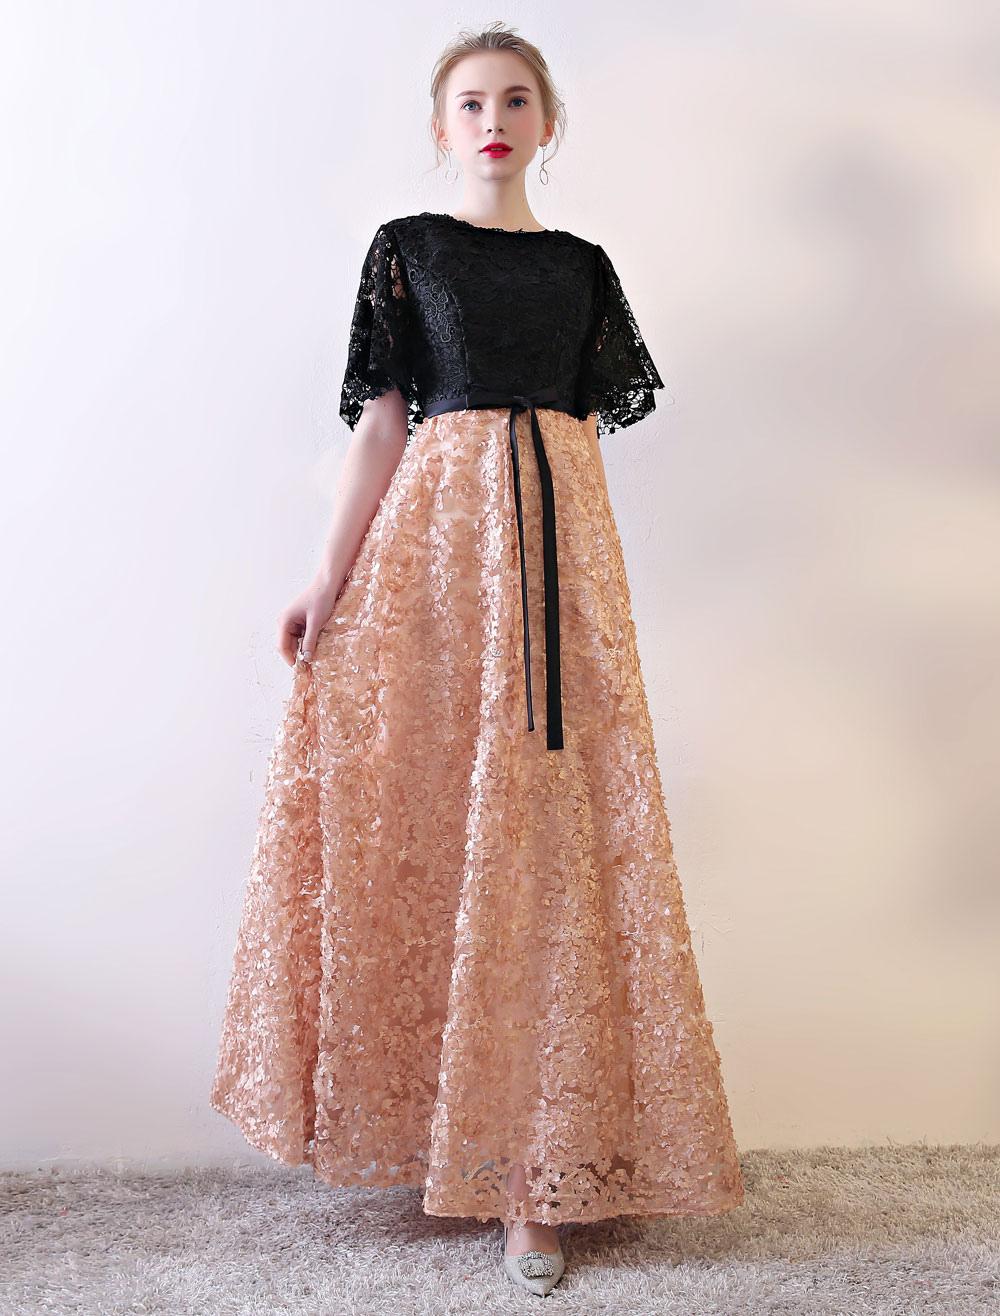 Black Prom Dresses Lace Contrast Color Half Sleeve Illusion Ribbon Sash Floor Length Occasion Dress